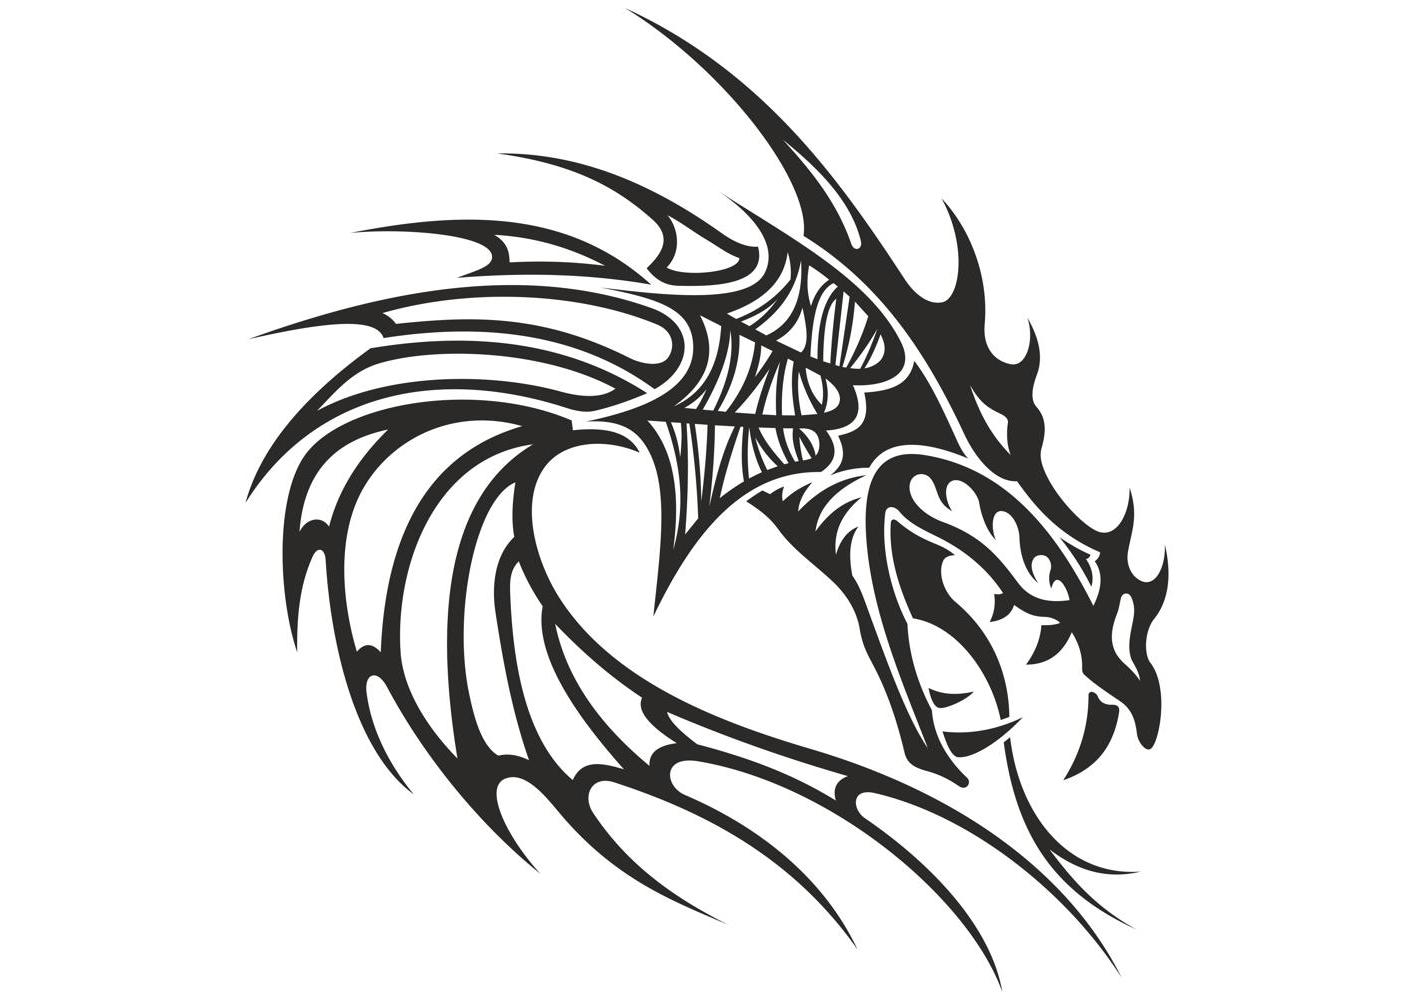 Best HD Dragon Head Clip Art Vector Photos » Free Vector Art, Images.